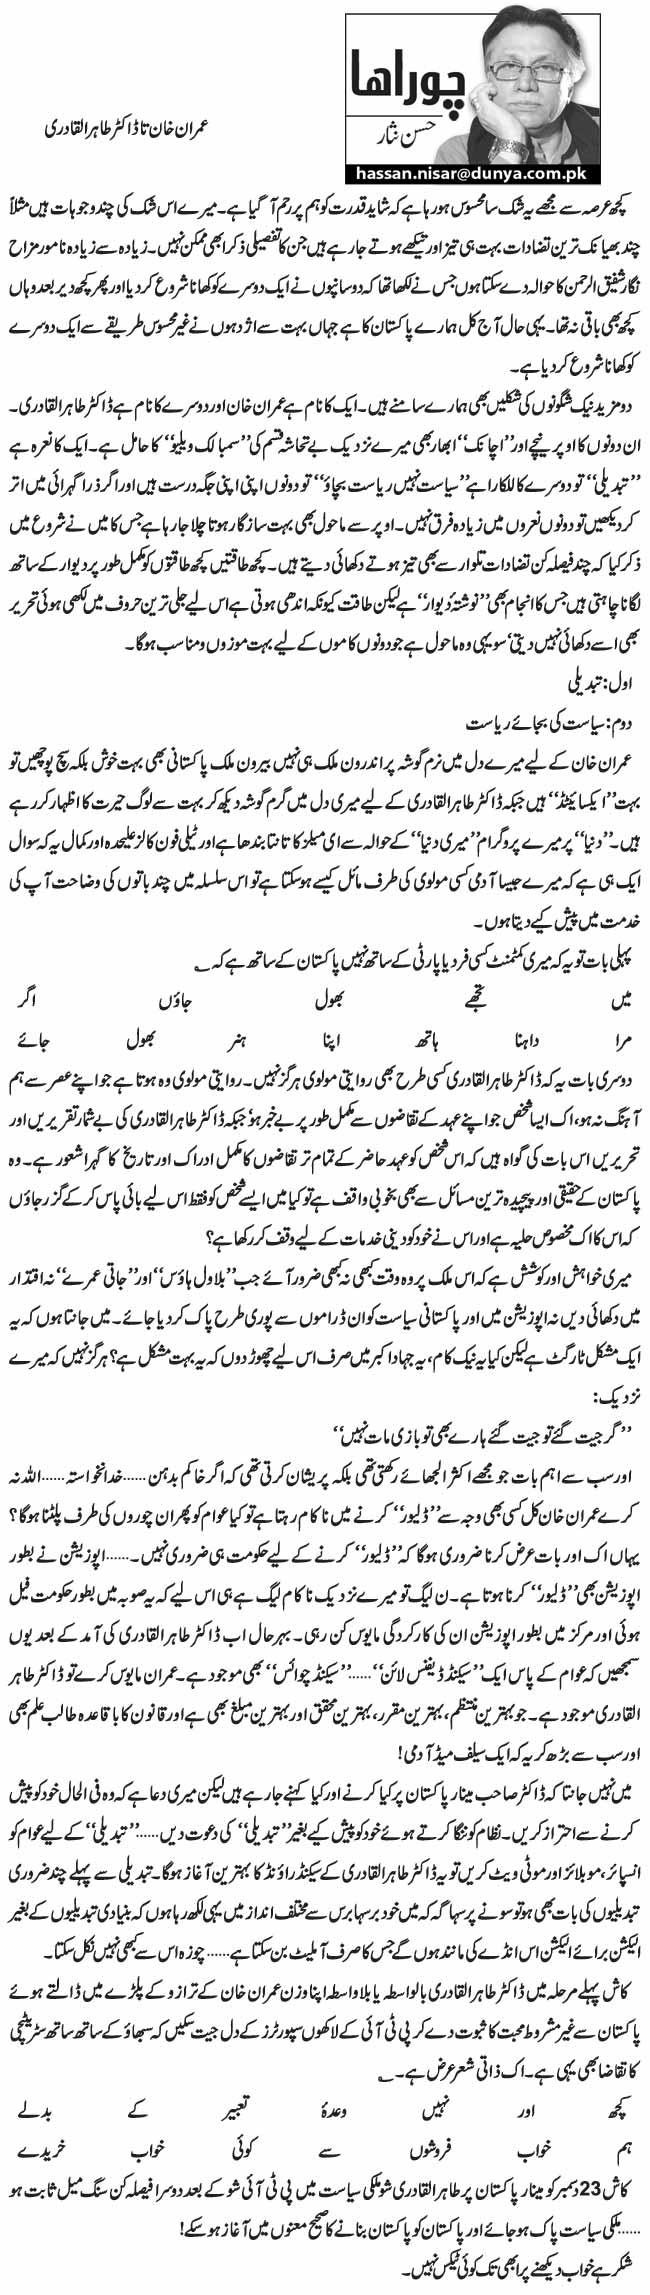 Tahirul, Qadri, Imran, Khan, Hassan, Nisar, Pakistan, Politics